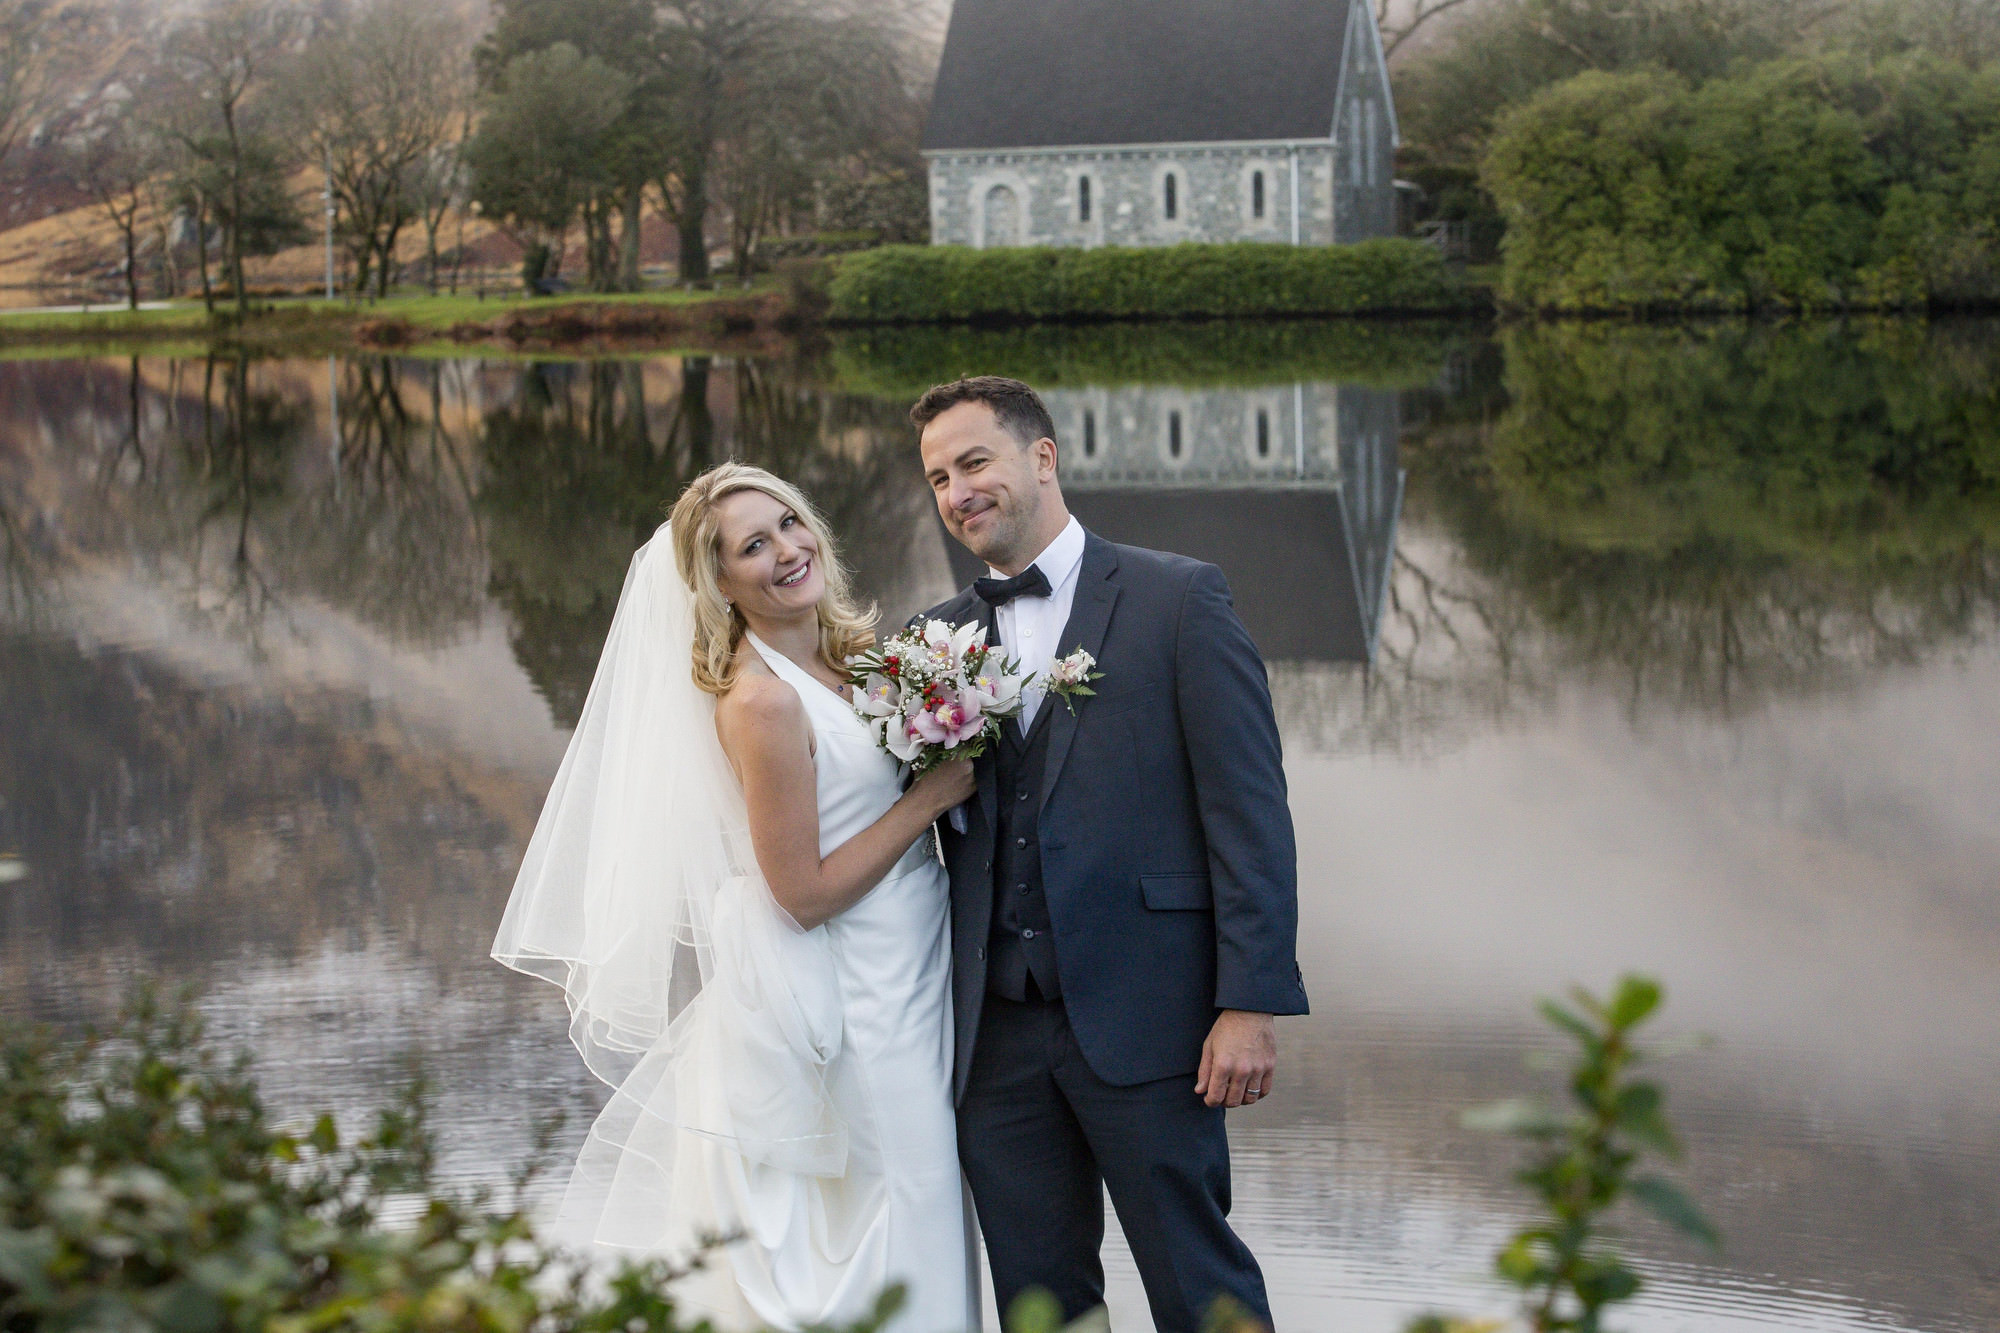 muckross_park_hotel_grougane_barra_wedding_photographer_goldenmoments_055.jpg